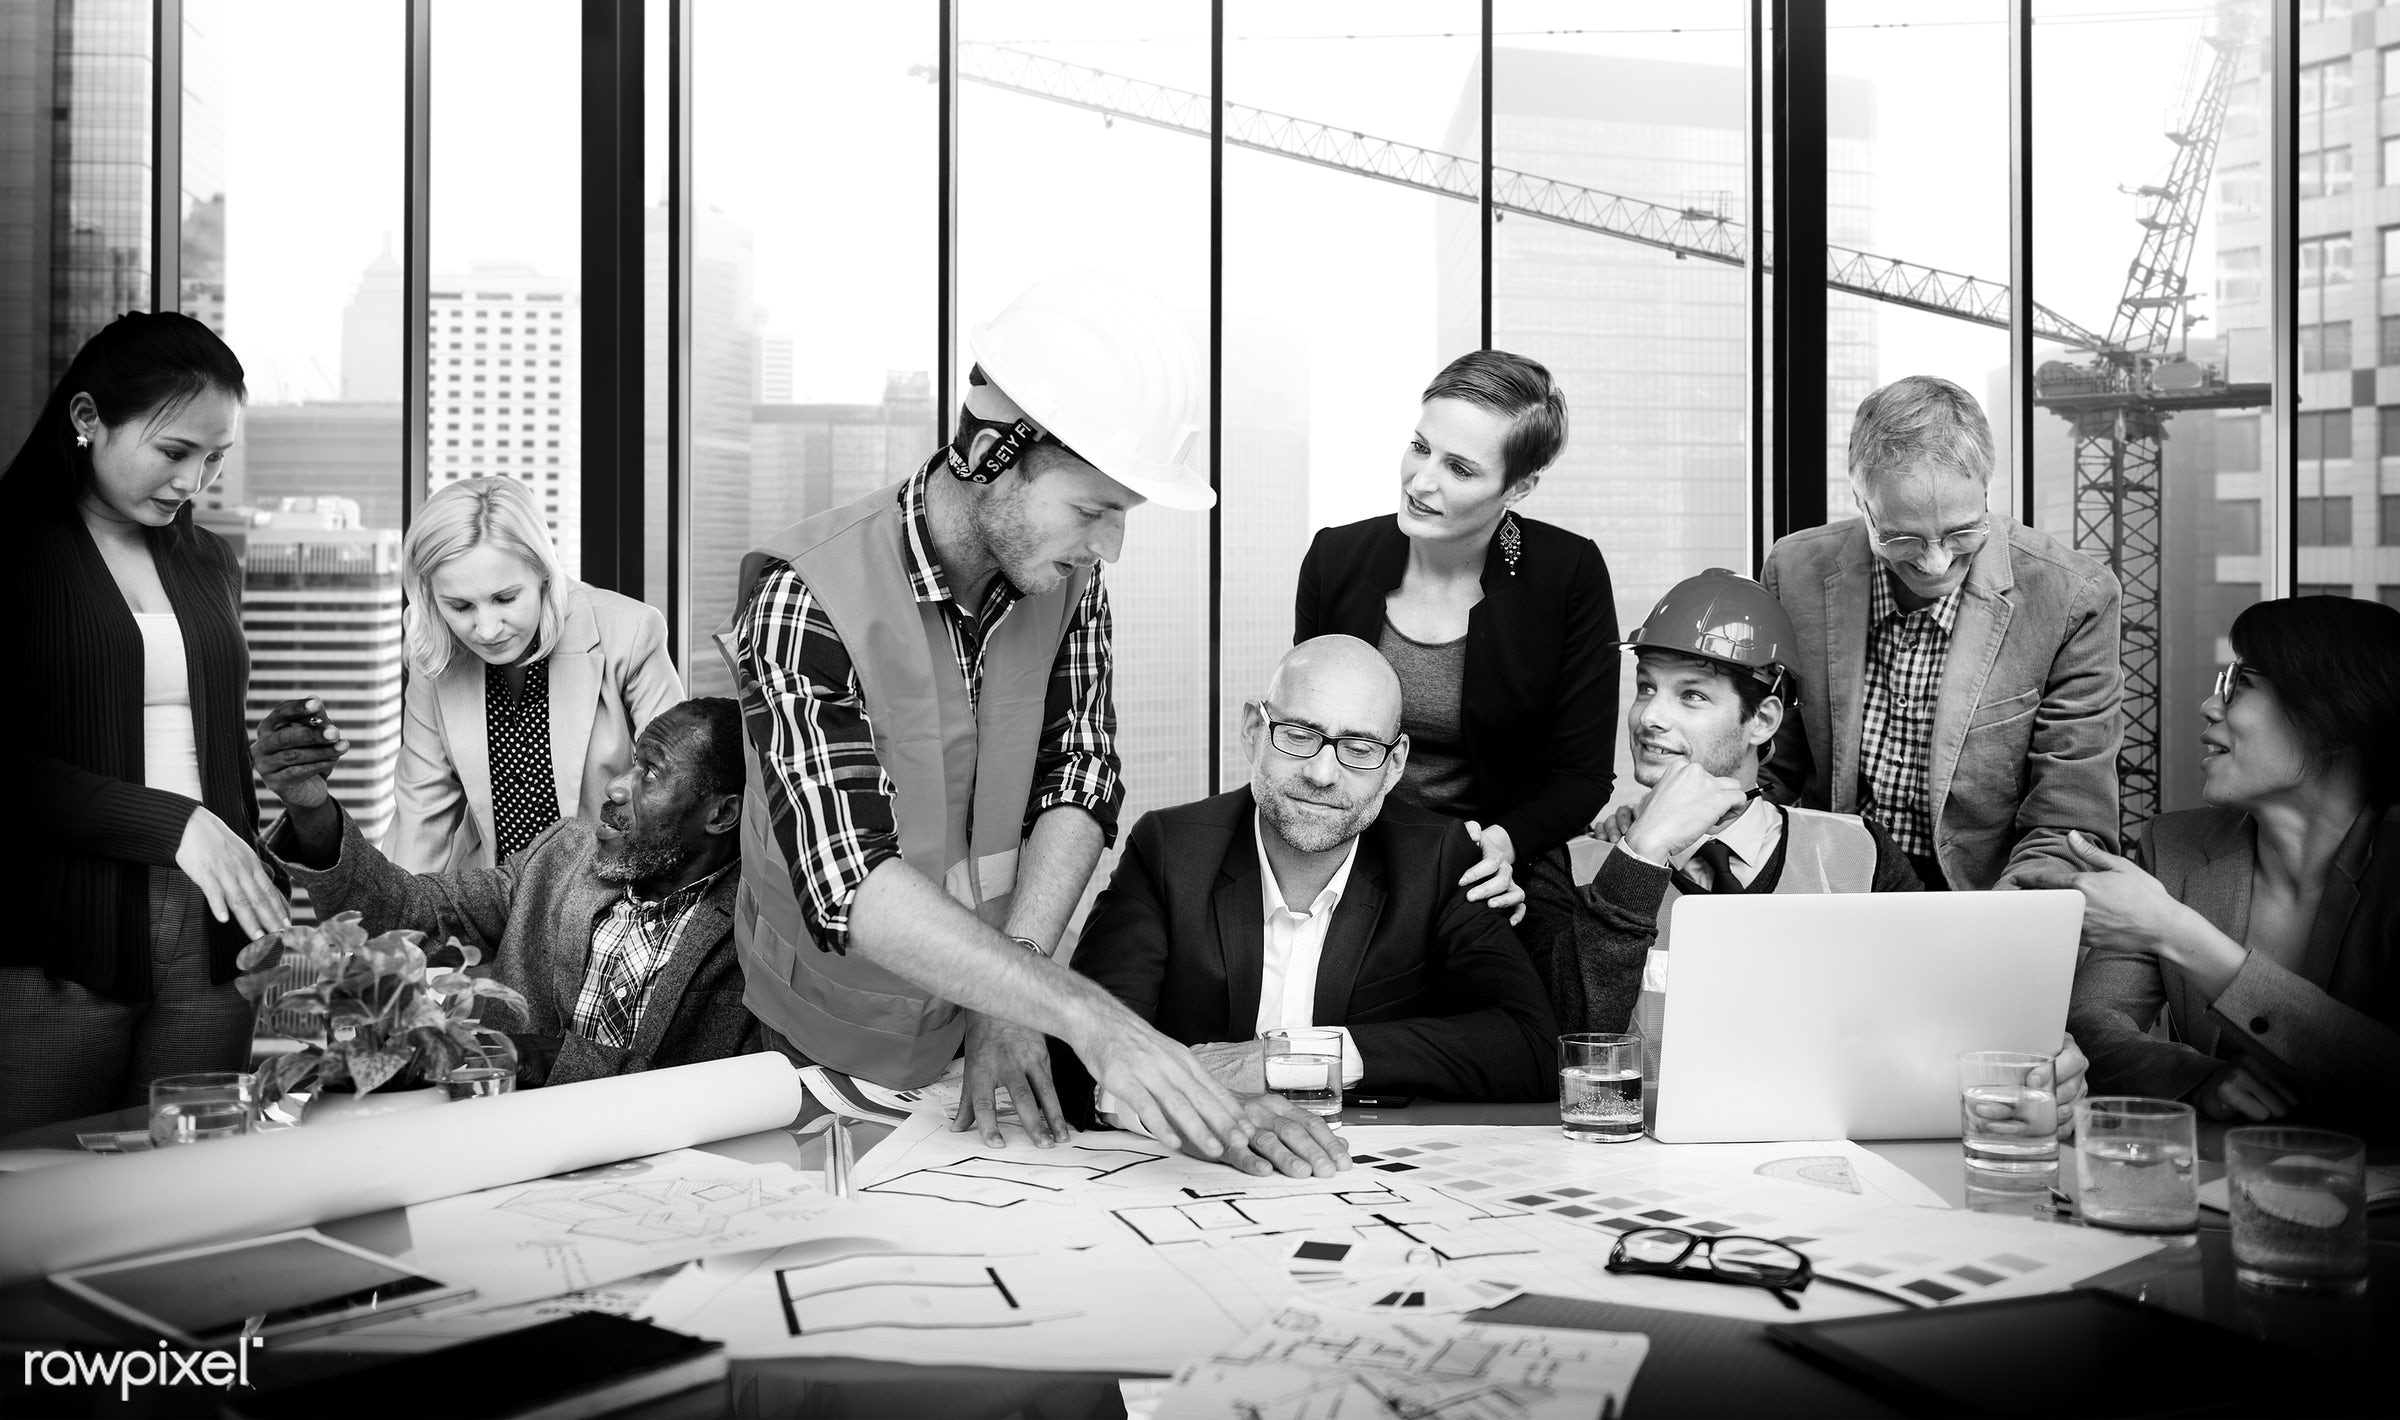 african descent, architect, asian ethnicity, blueprint, boardroom, brainstorming, business, business people, businessmen,...